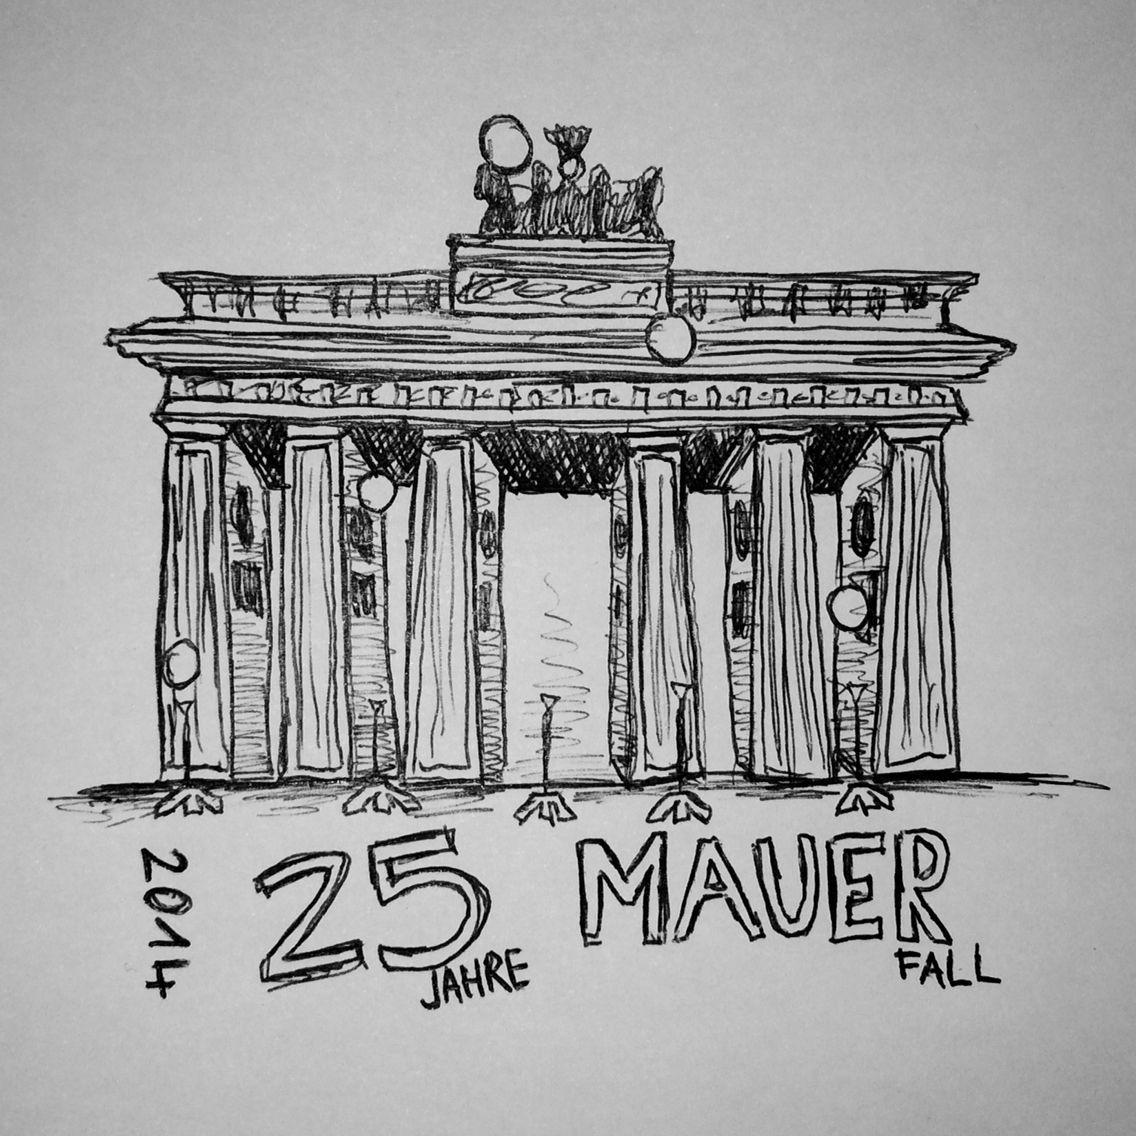 Brandenburg Tor Berlin 25 Jahre Mauerfall 2014 Fall Of The Wall